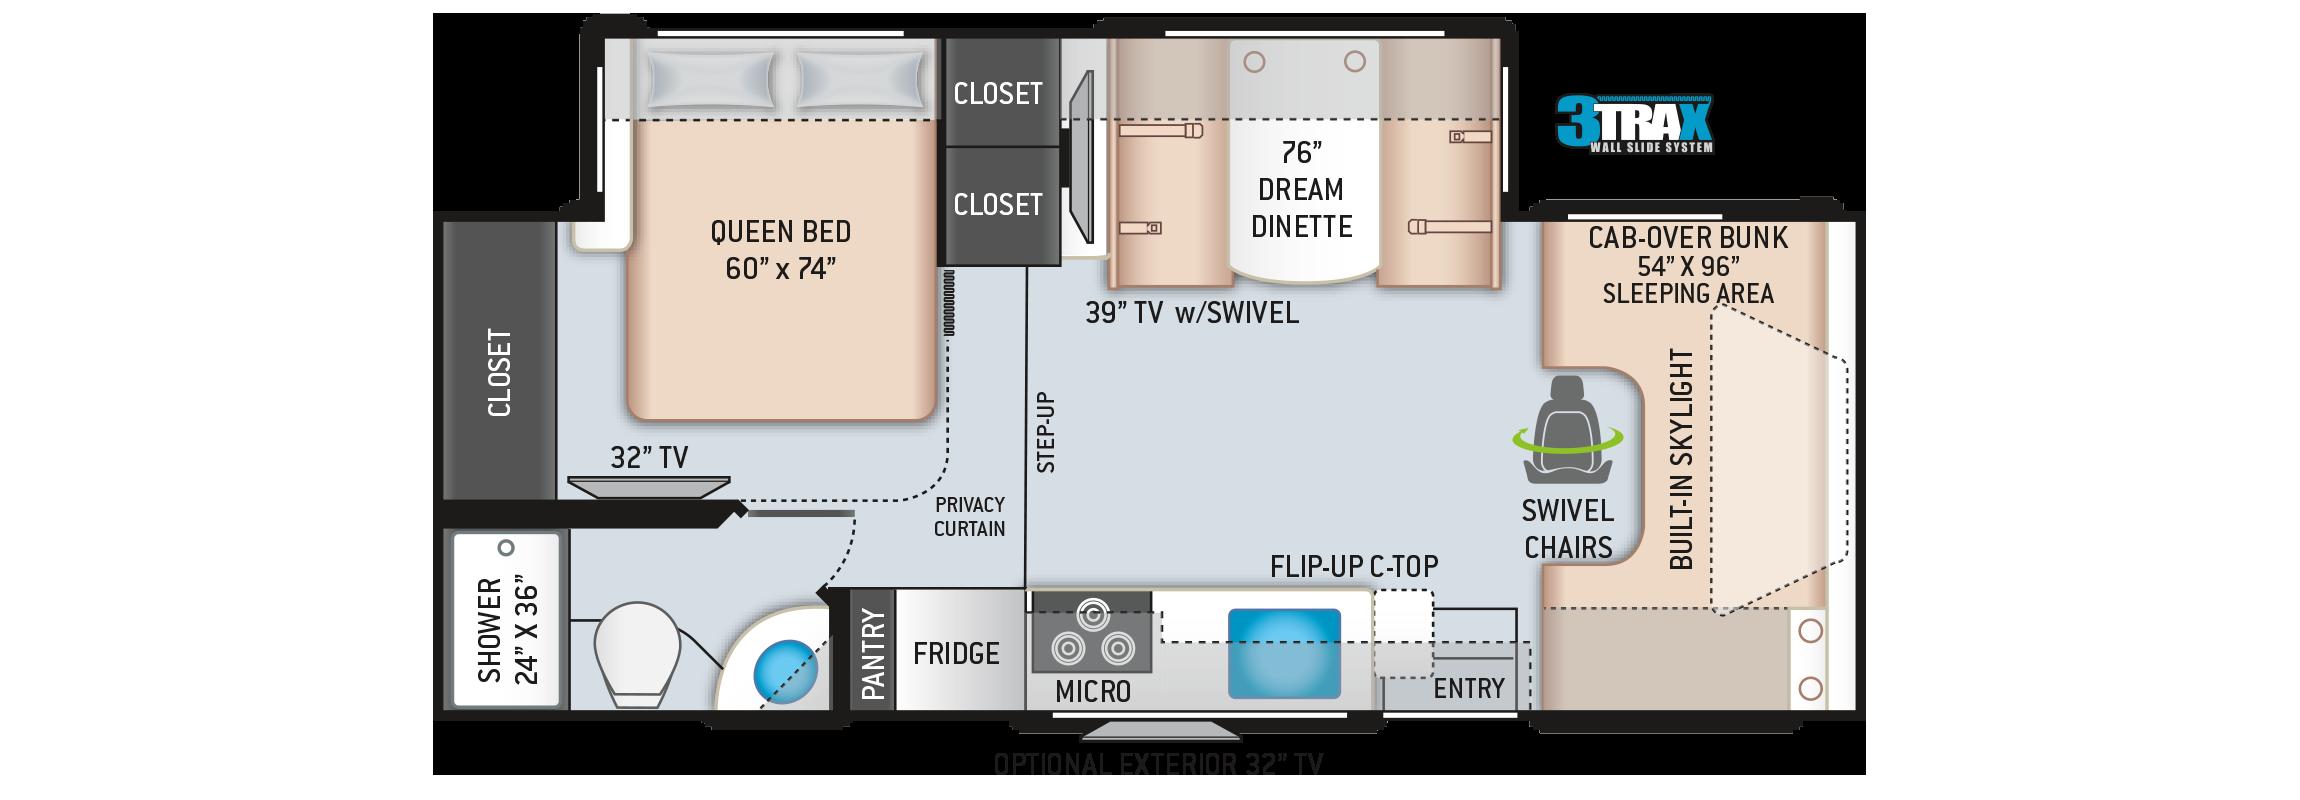 Quantum Class C Motorhome RC25 Floor Plan